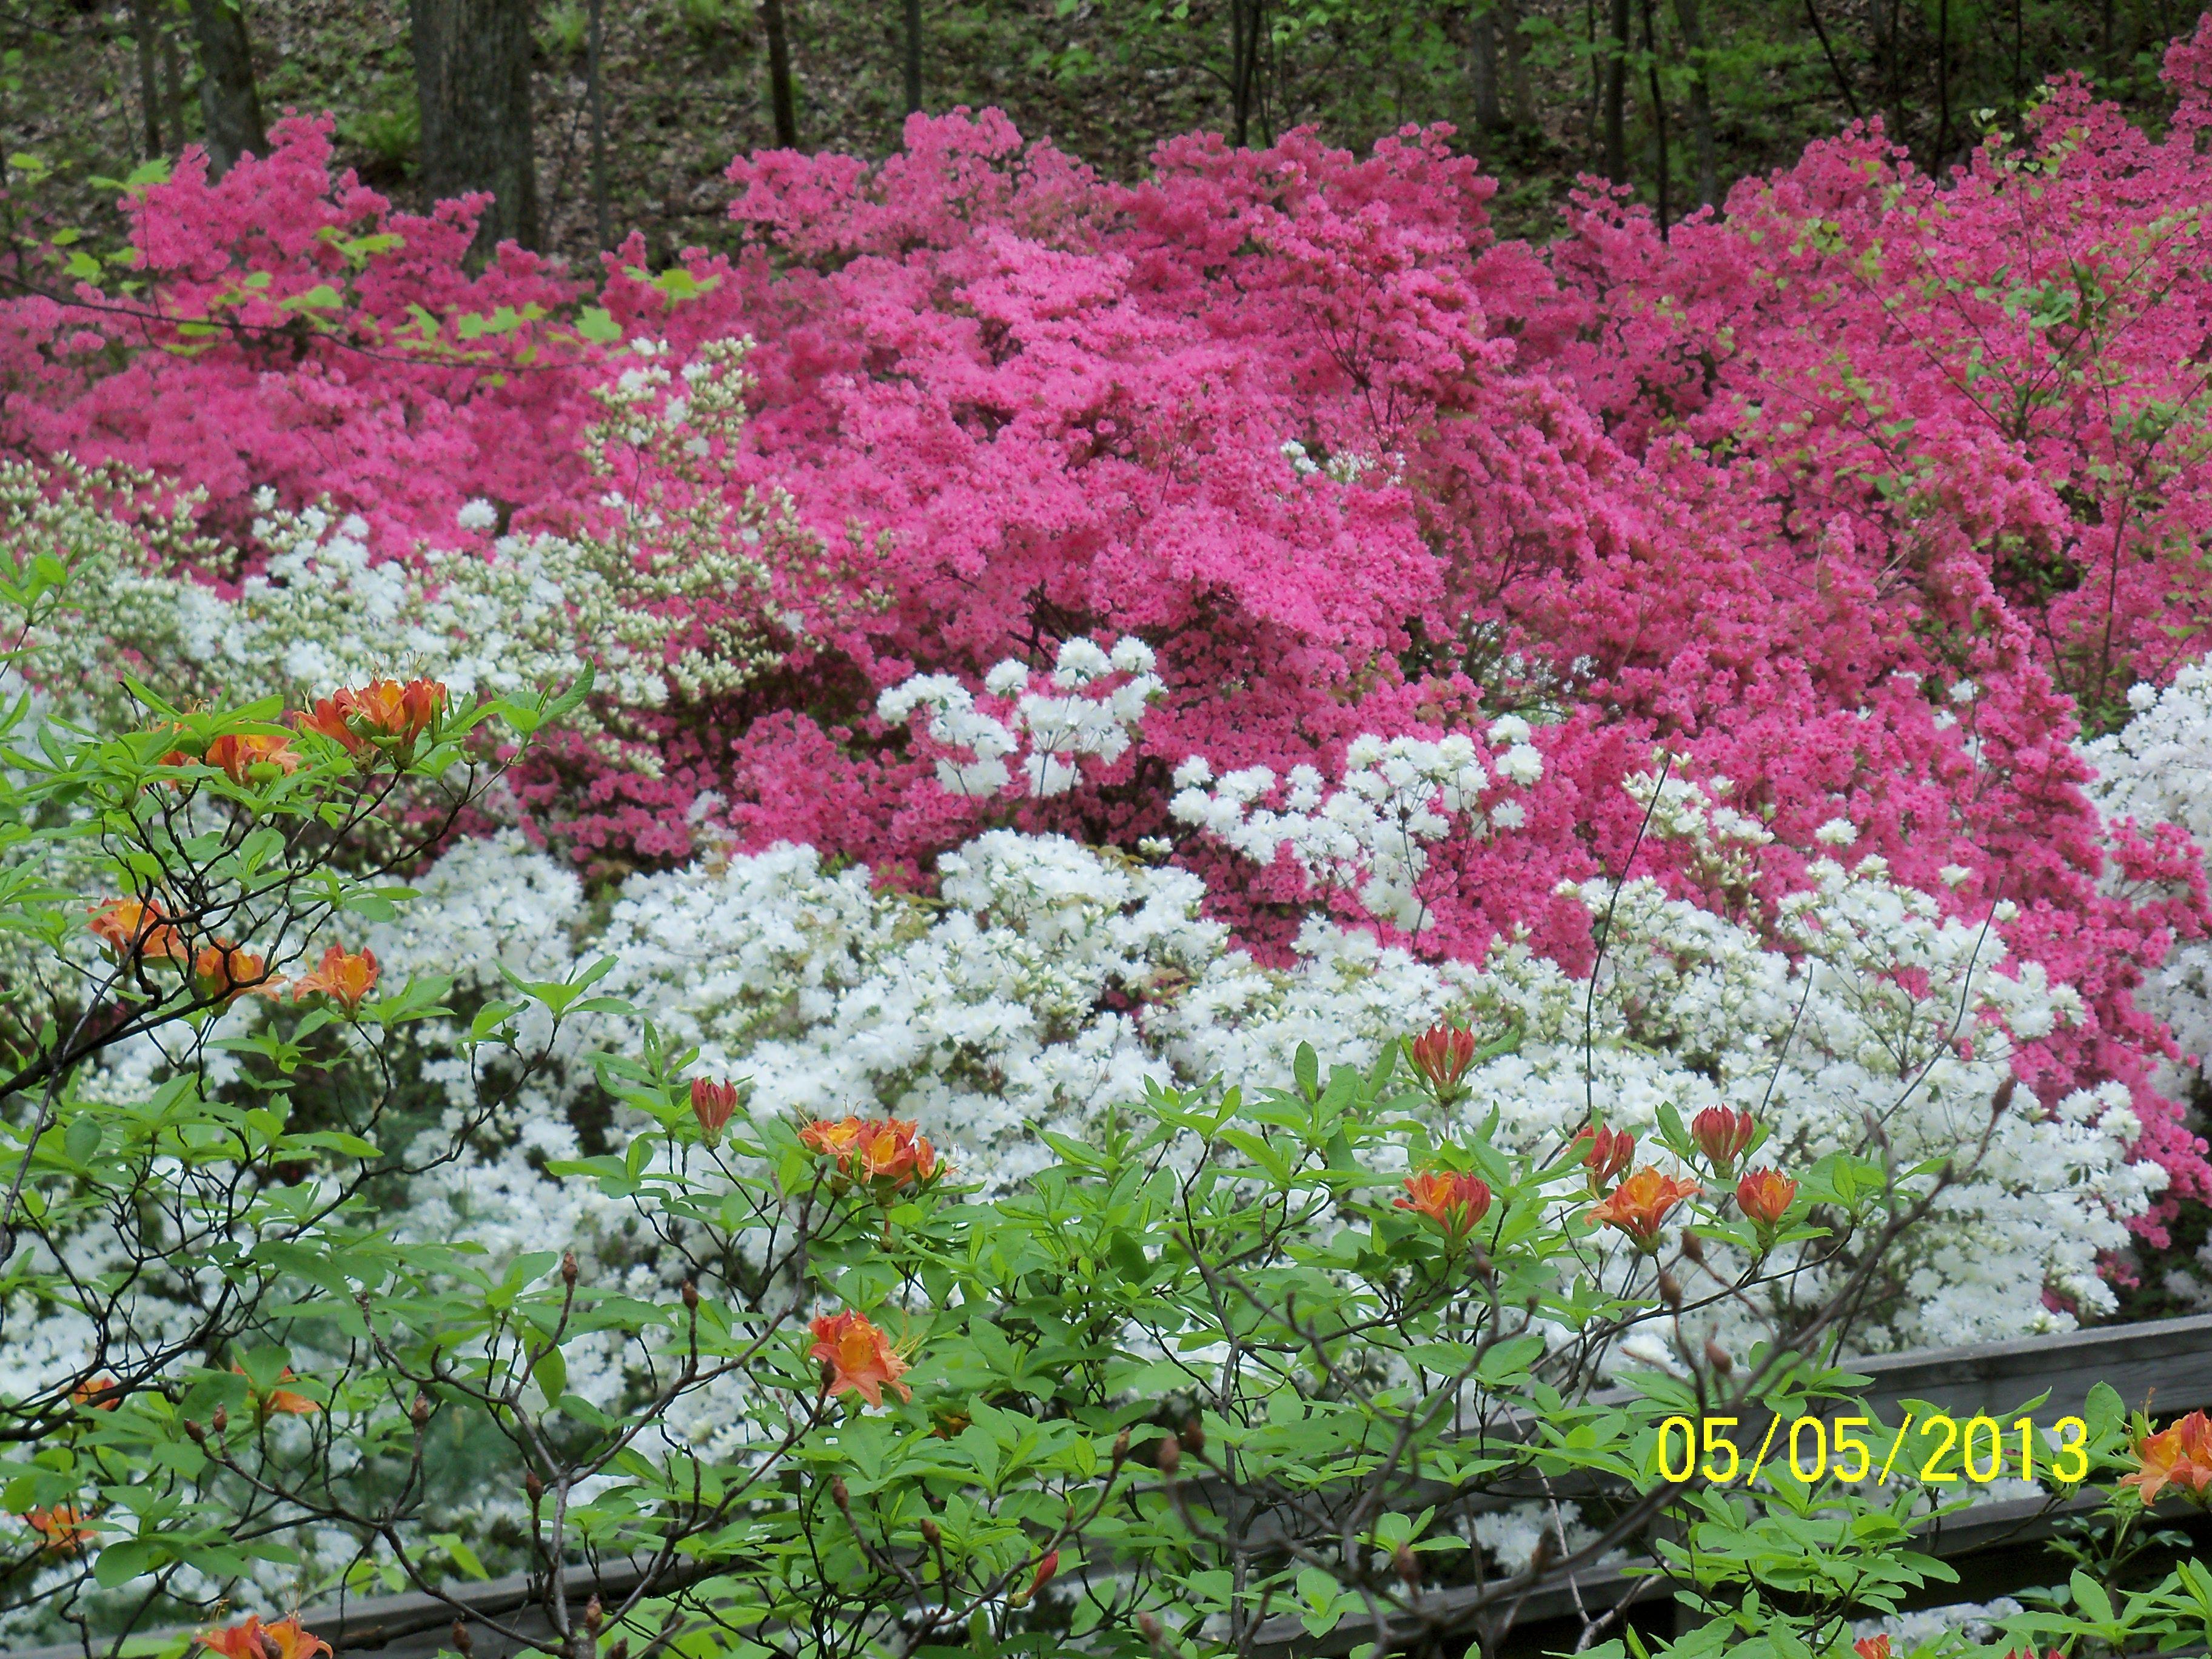 Spring garden ideas on pinterest photograph spring in va for Spring garden ideas